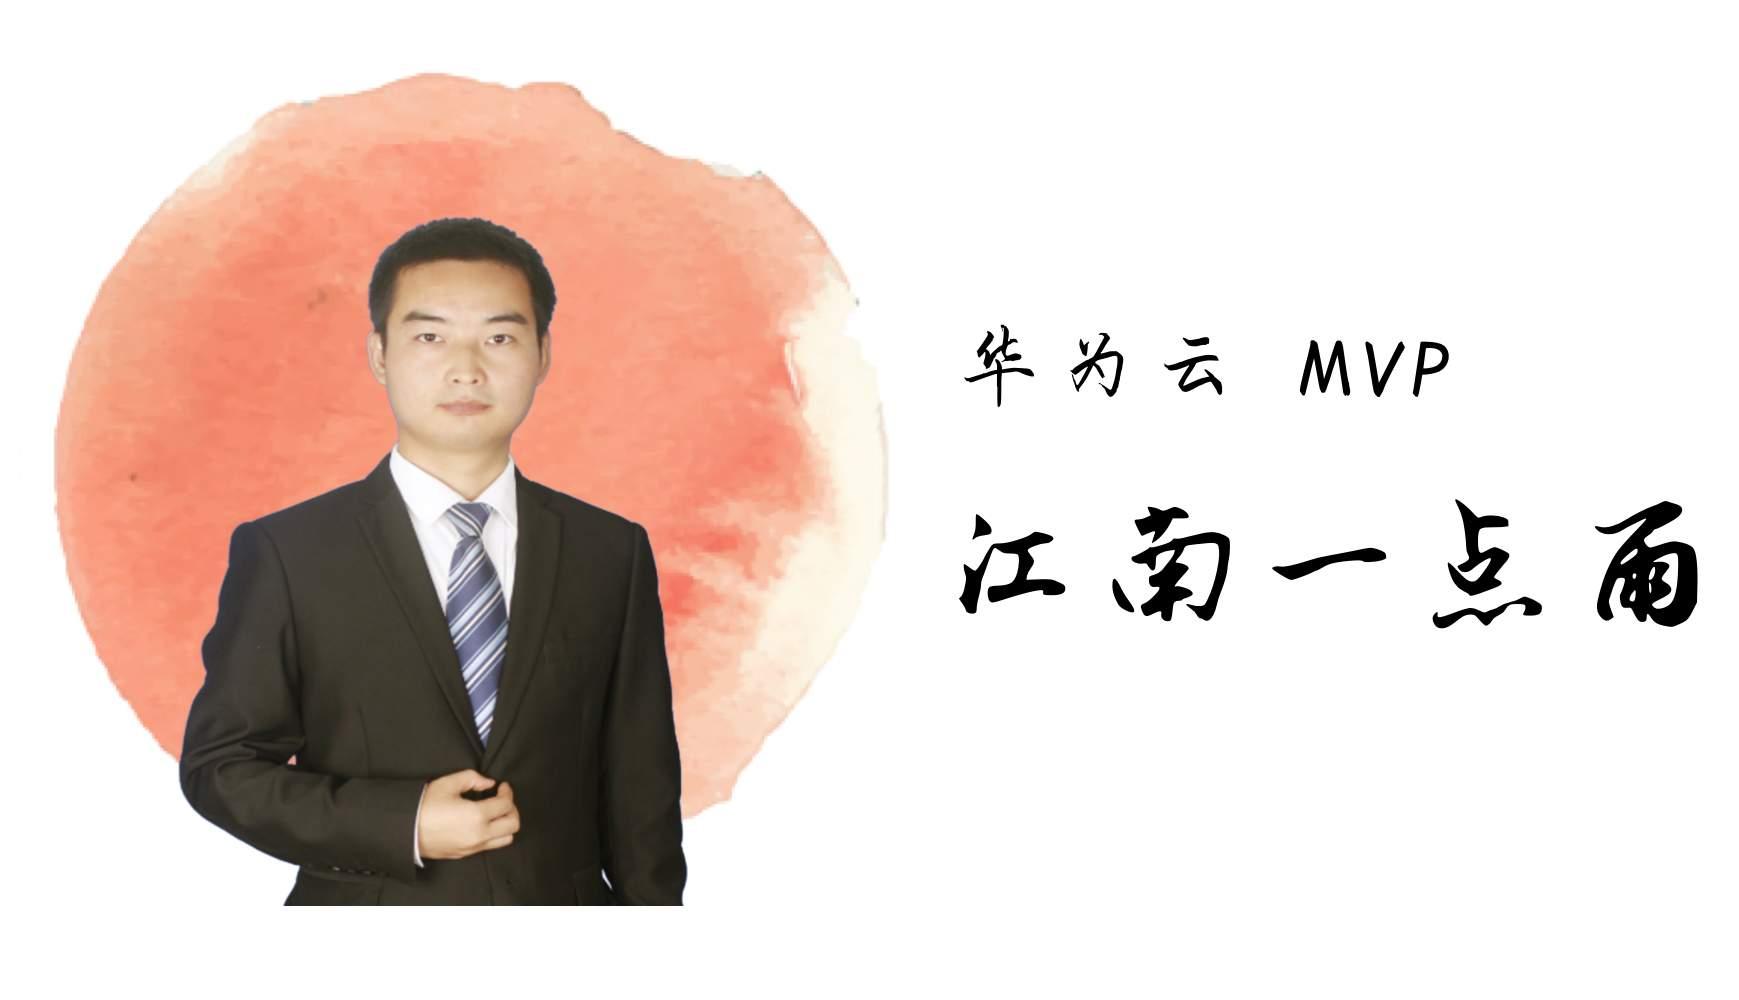 IMG_5296.JPG